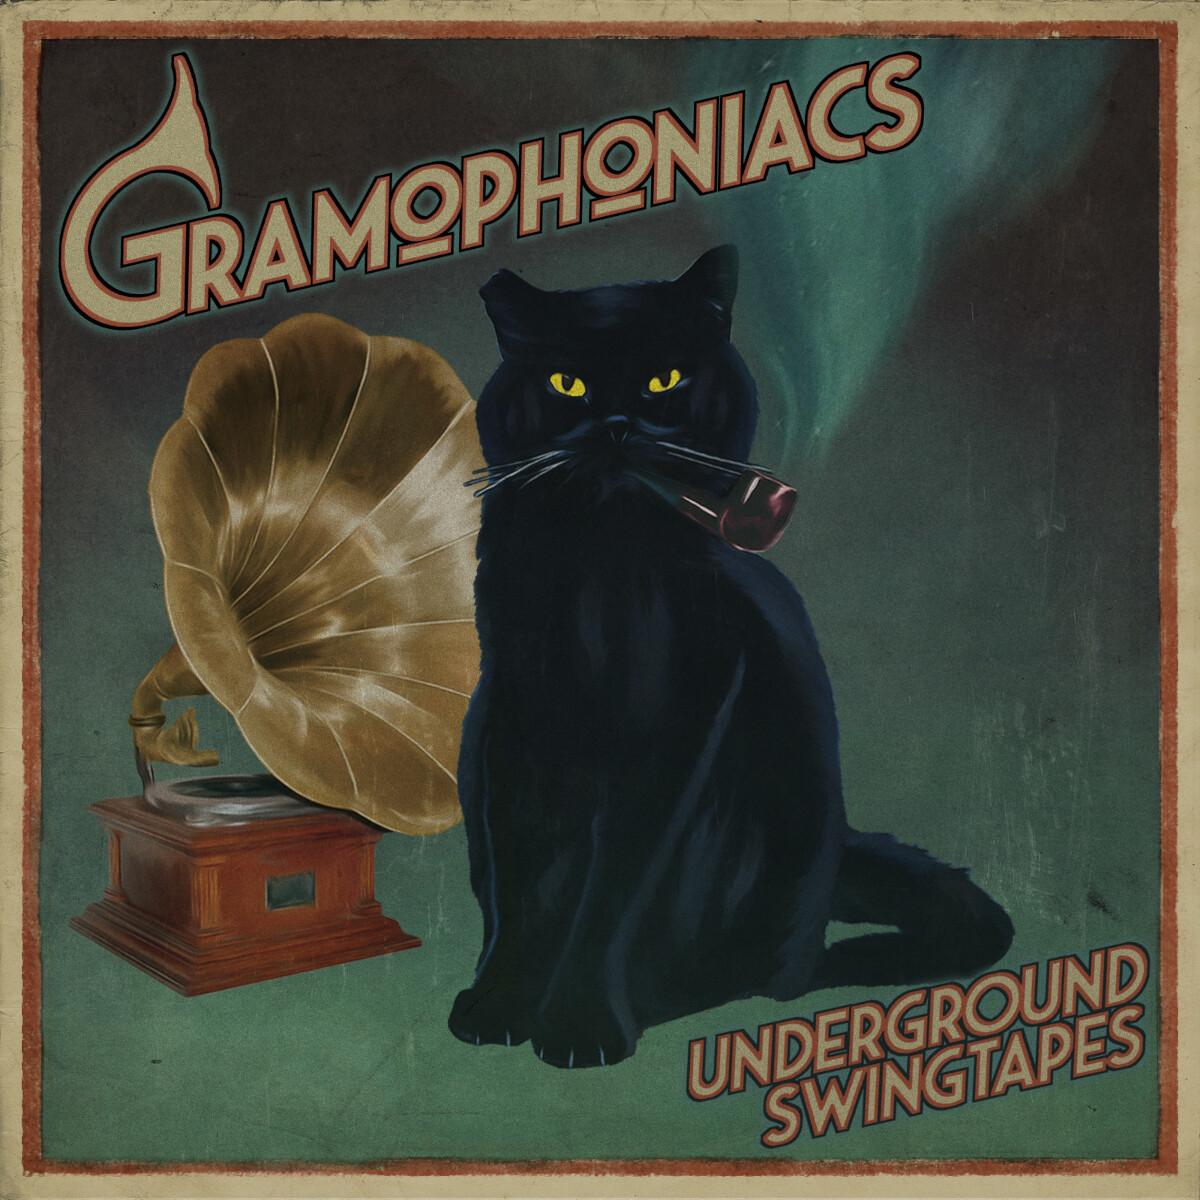 Gramophoniacs • Underground Swingtapes